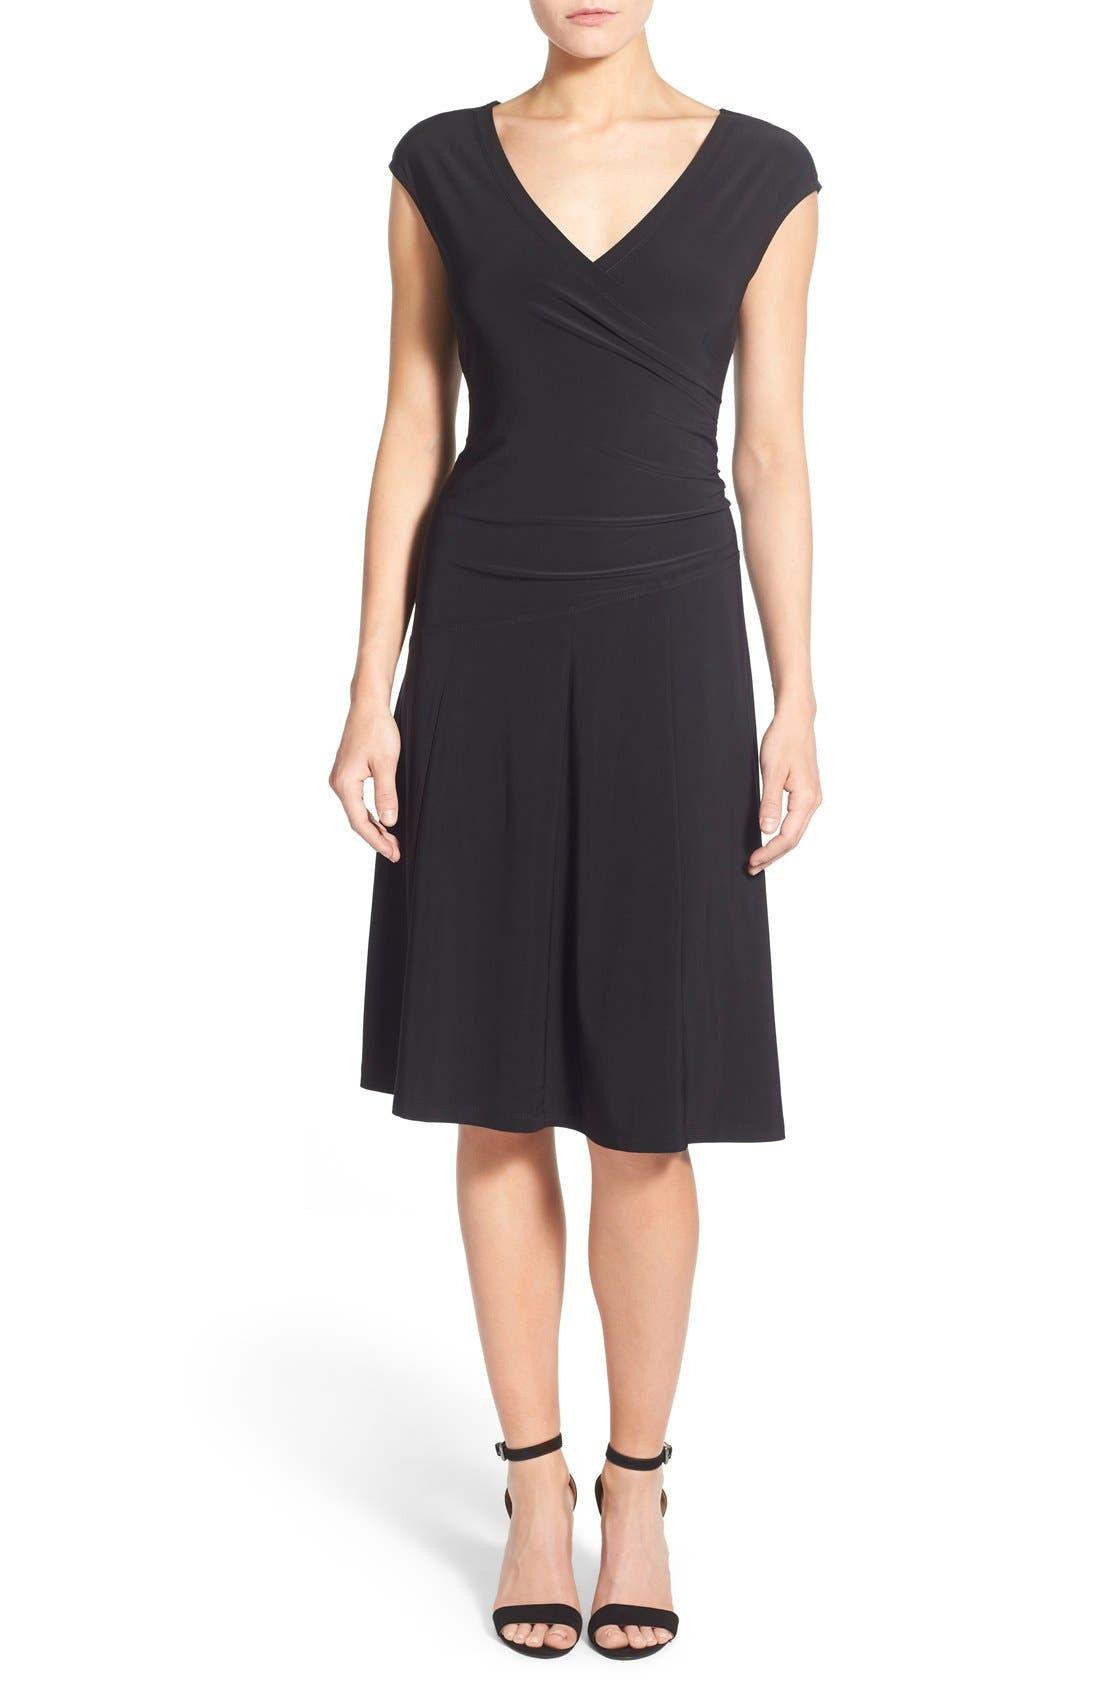 Alternate Image 1 Selected - NIC+ZOE Matte Jersey Faux Wrap Fit & Flare Dress